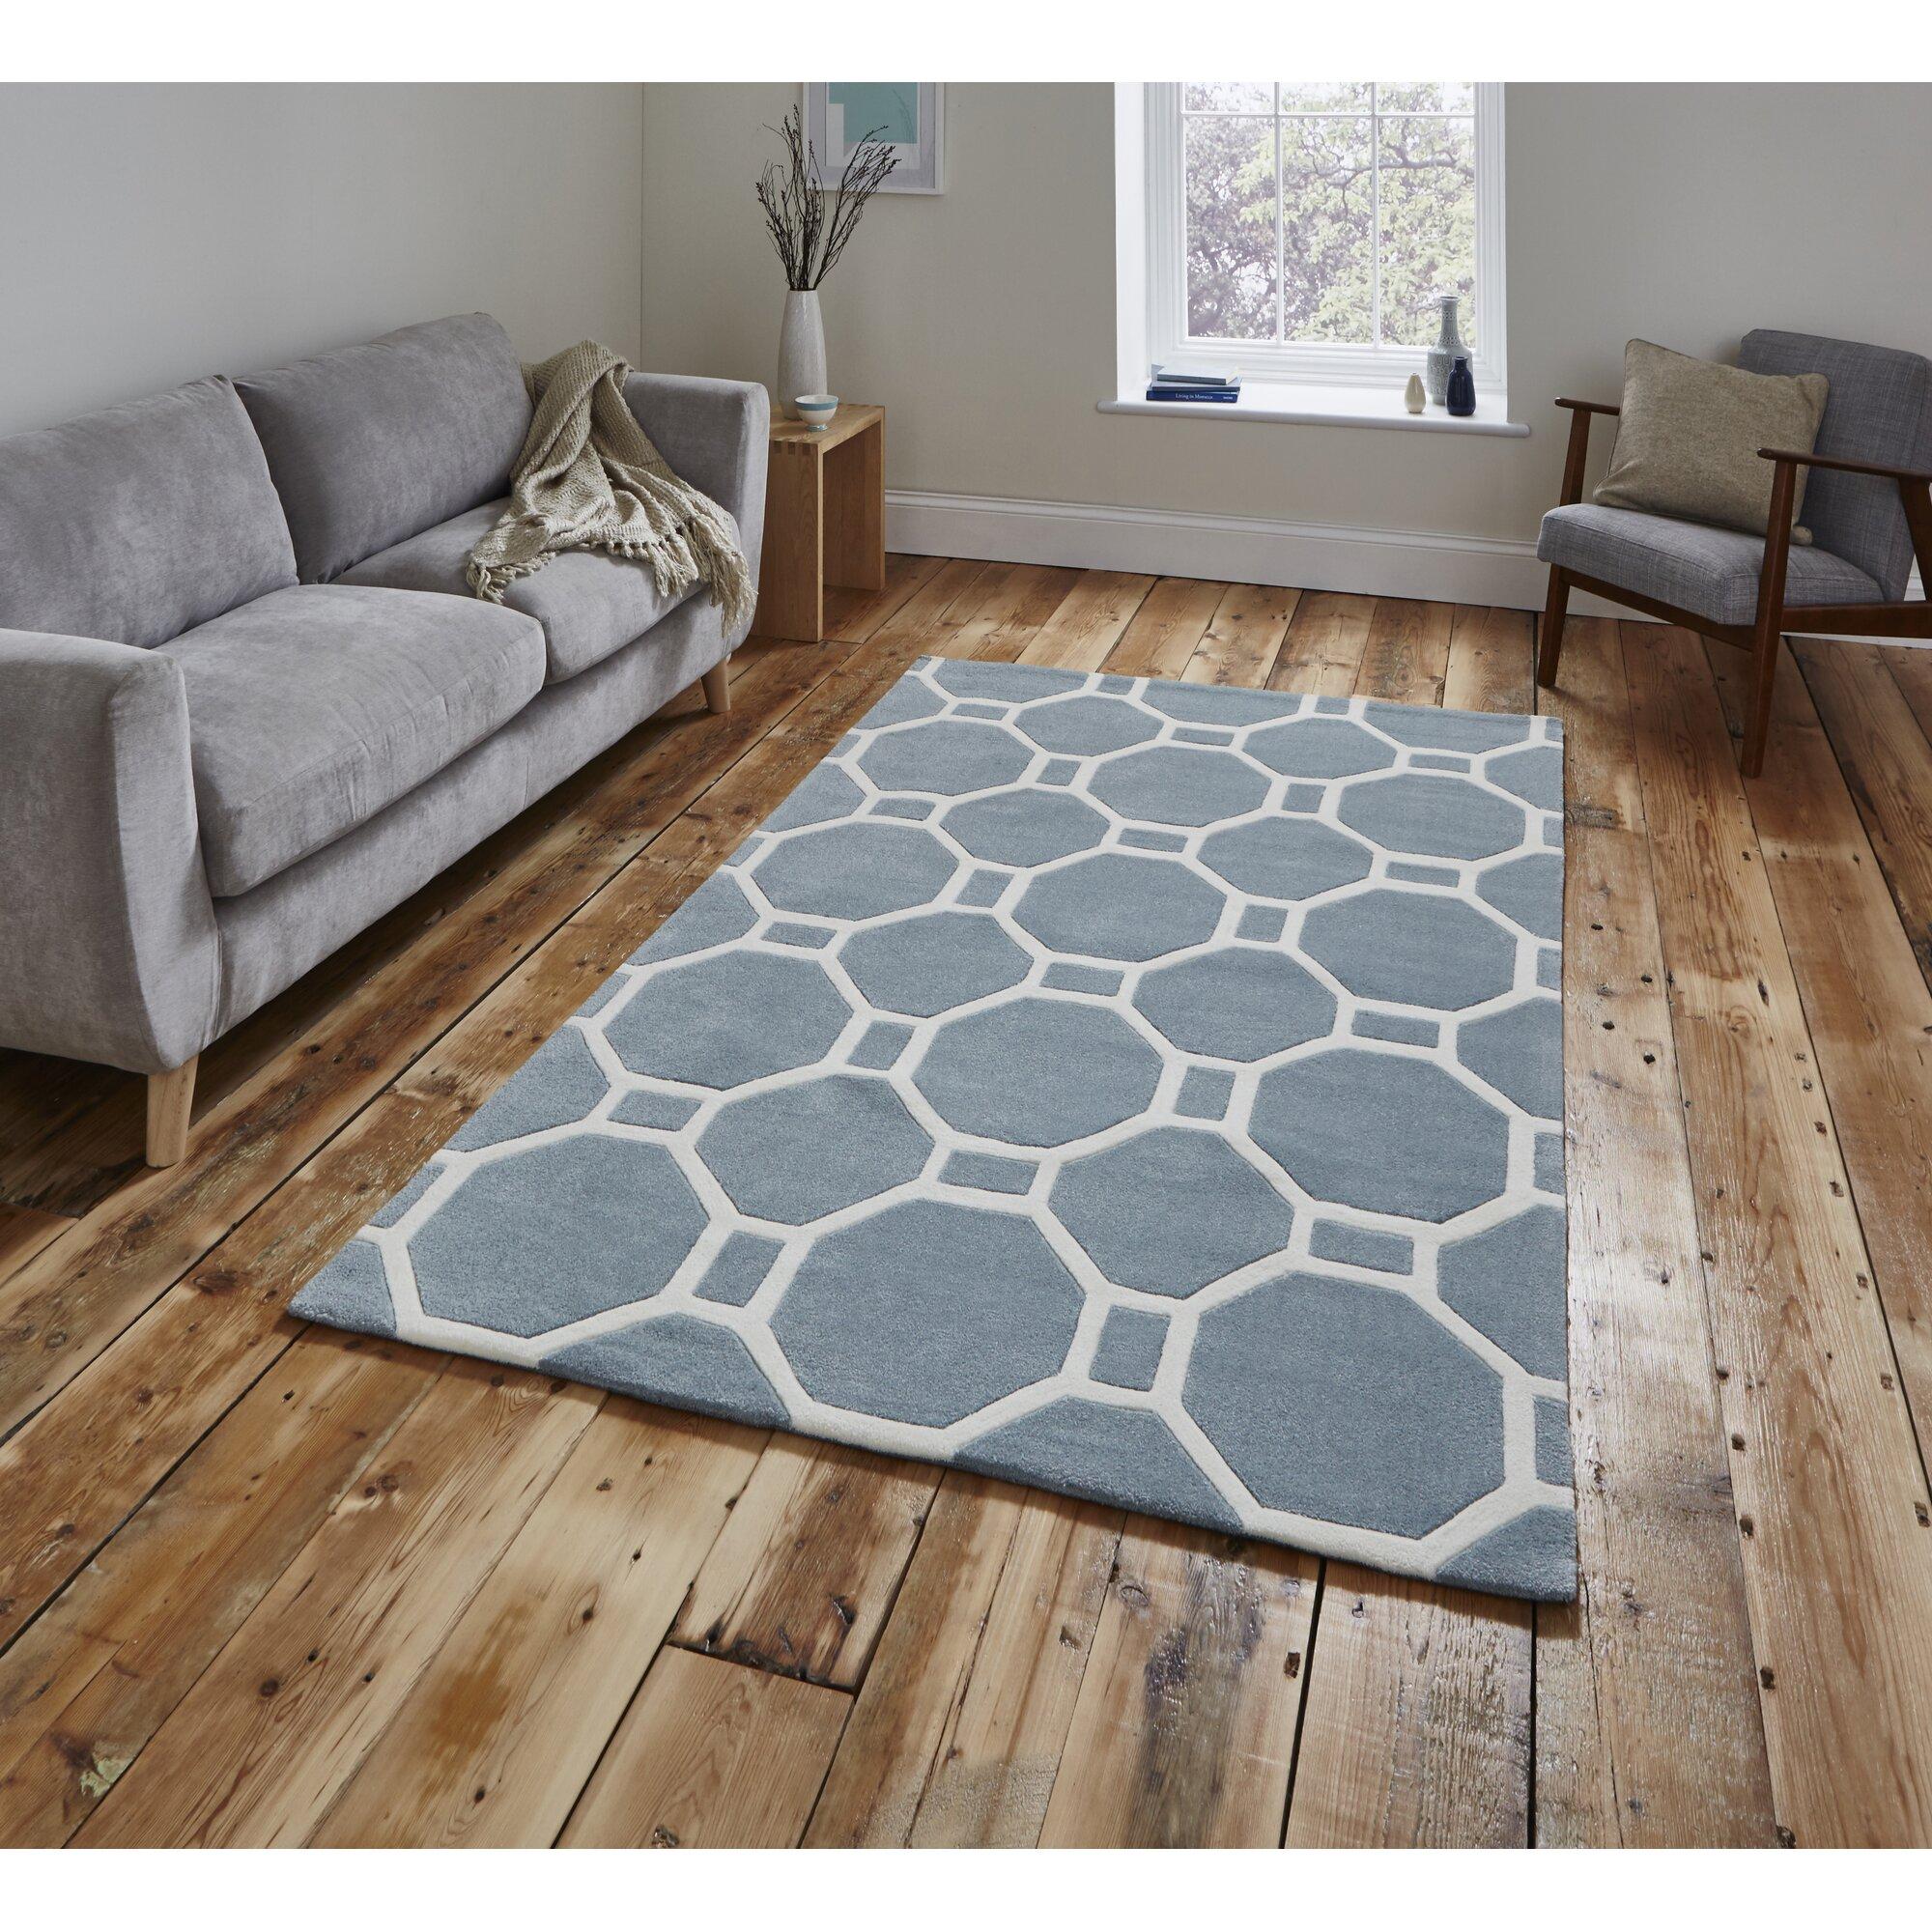 think rugs handgetufteter teppich hong kong in hellblau bewertungen. Black Bedroom Furniture Sets. Home Design Ideas